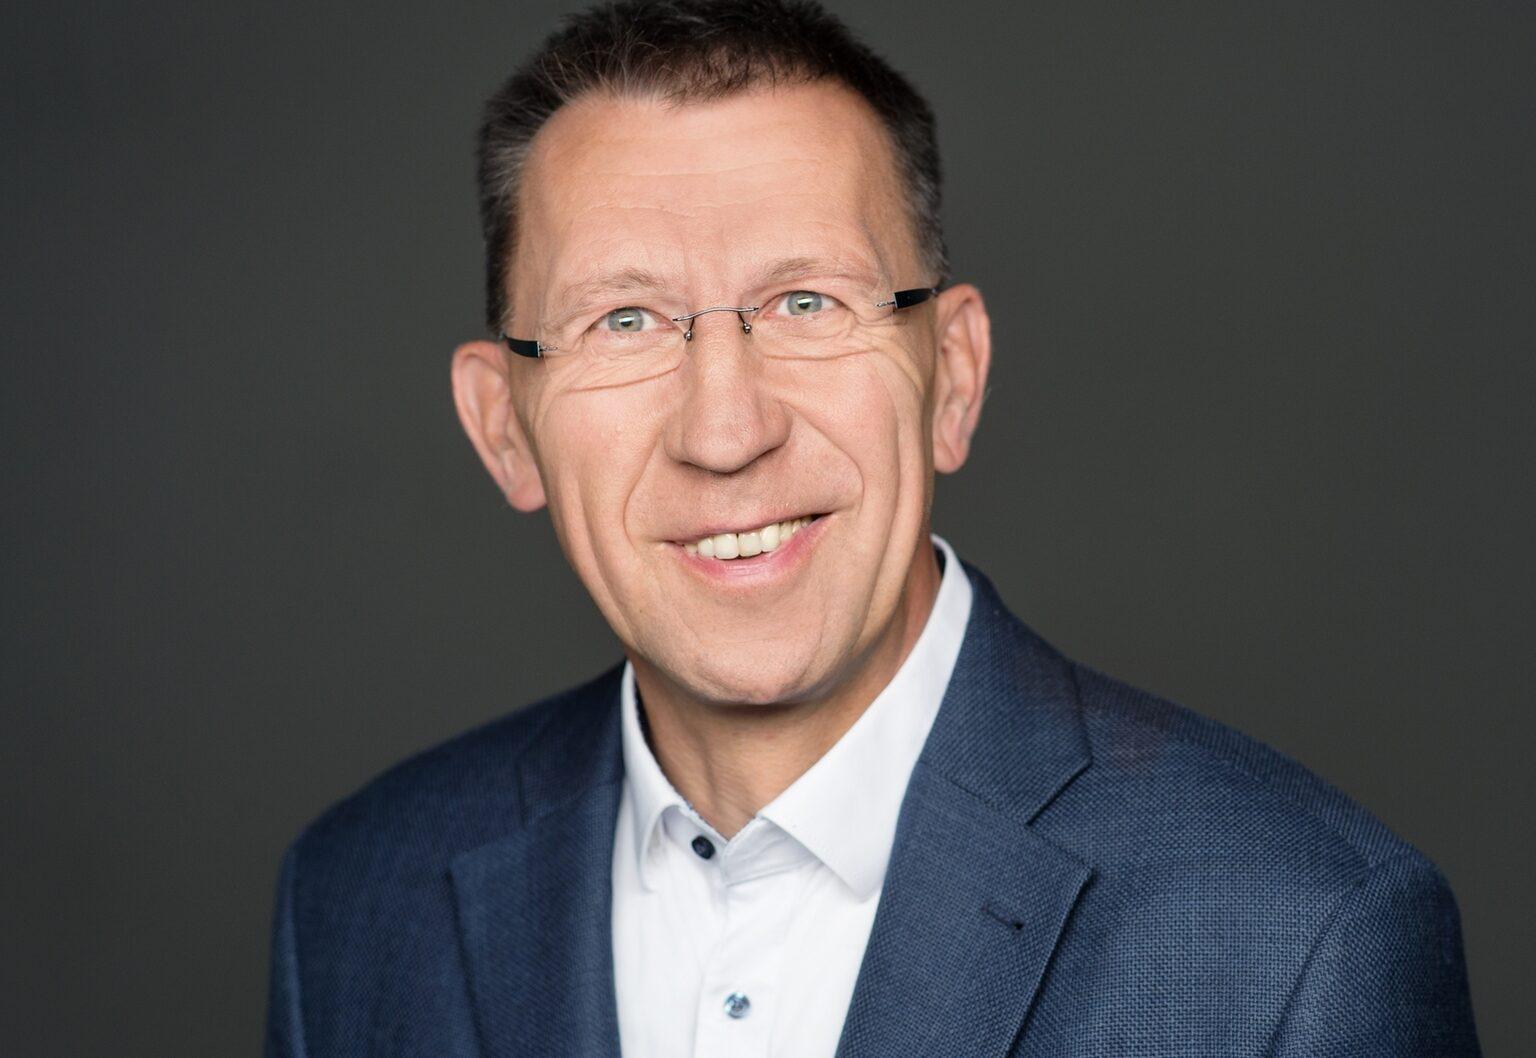 https://www.vdskc.de/wp-content/uploads/2020/11/Ralf-Blauert_-1.-Vorsitzender-e1612094709480.jpg